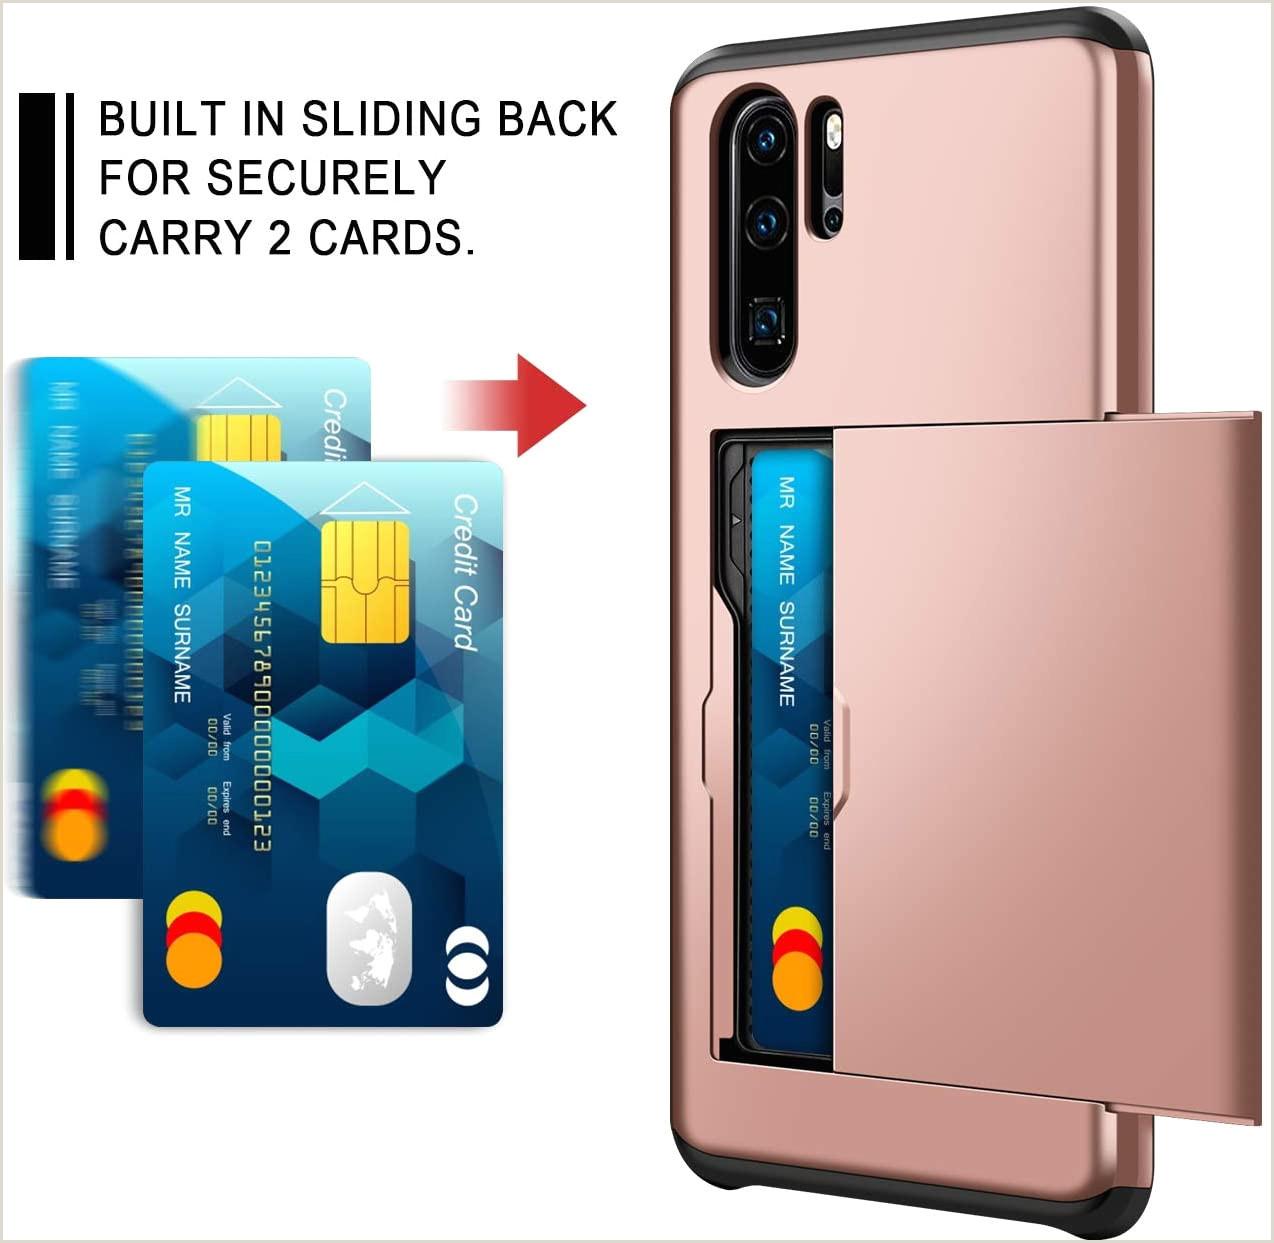 Business Card Back Side Coolden For Huawei P30 Pro Case Armor Shockproof Case For Huawei P30 Pro Wallet Case Cover Protective Case Rubber Bumper Card Holder Slot Wallet Case